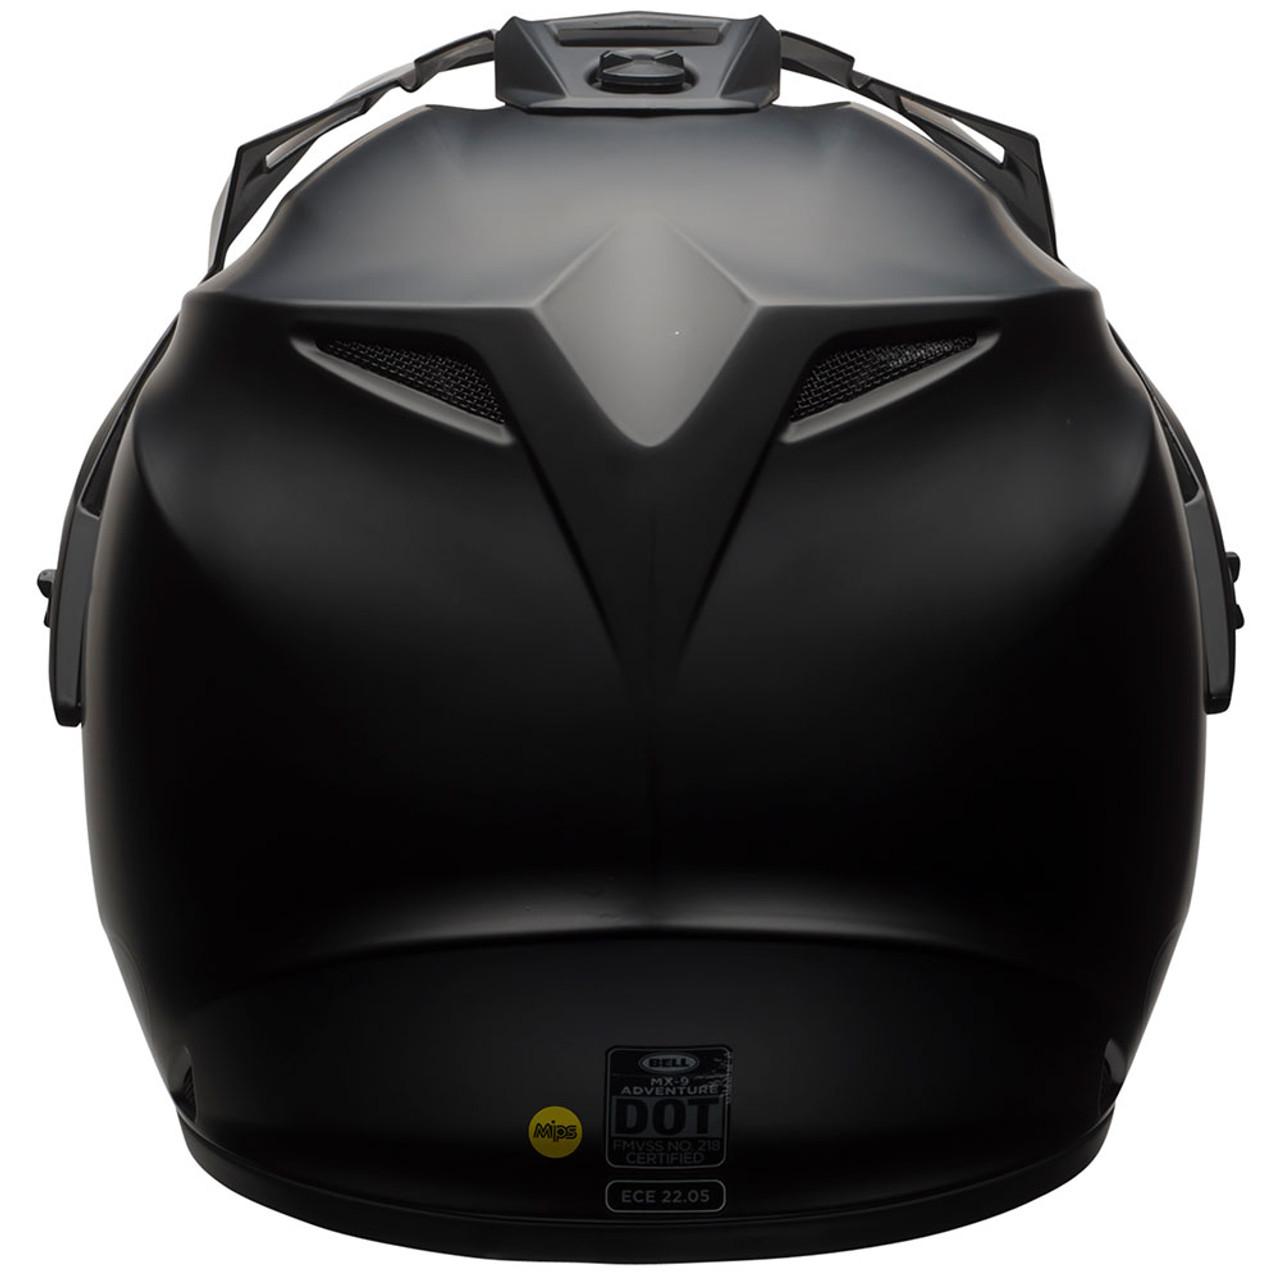 9d7651f2 ... Bell MX-9 Adventure Helmet w/ MIPS & Transitions Photochromic Shield ...